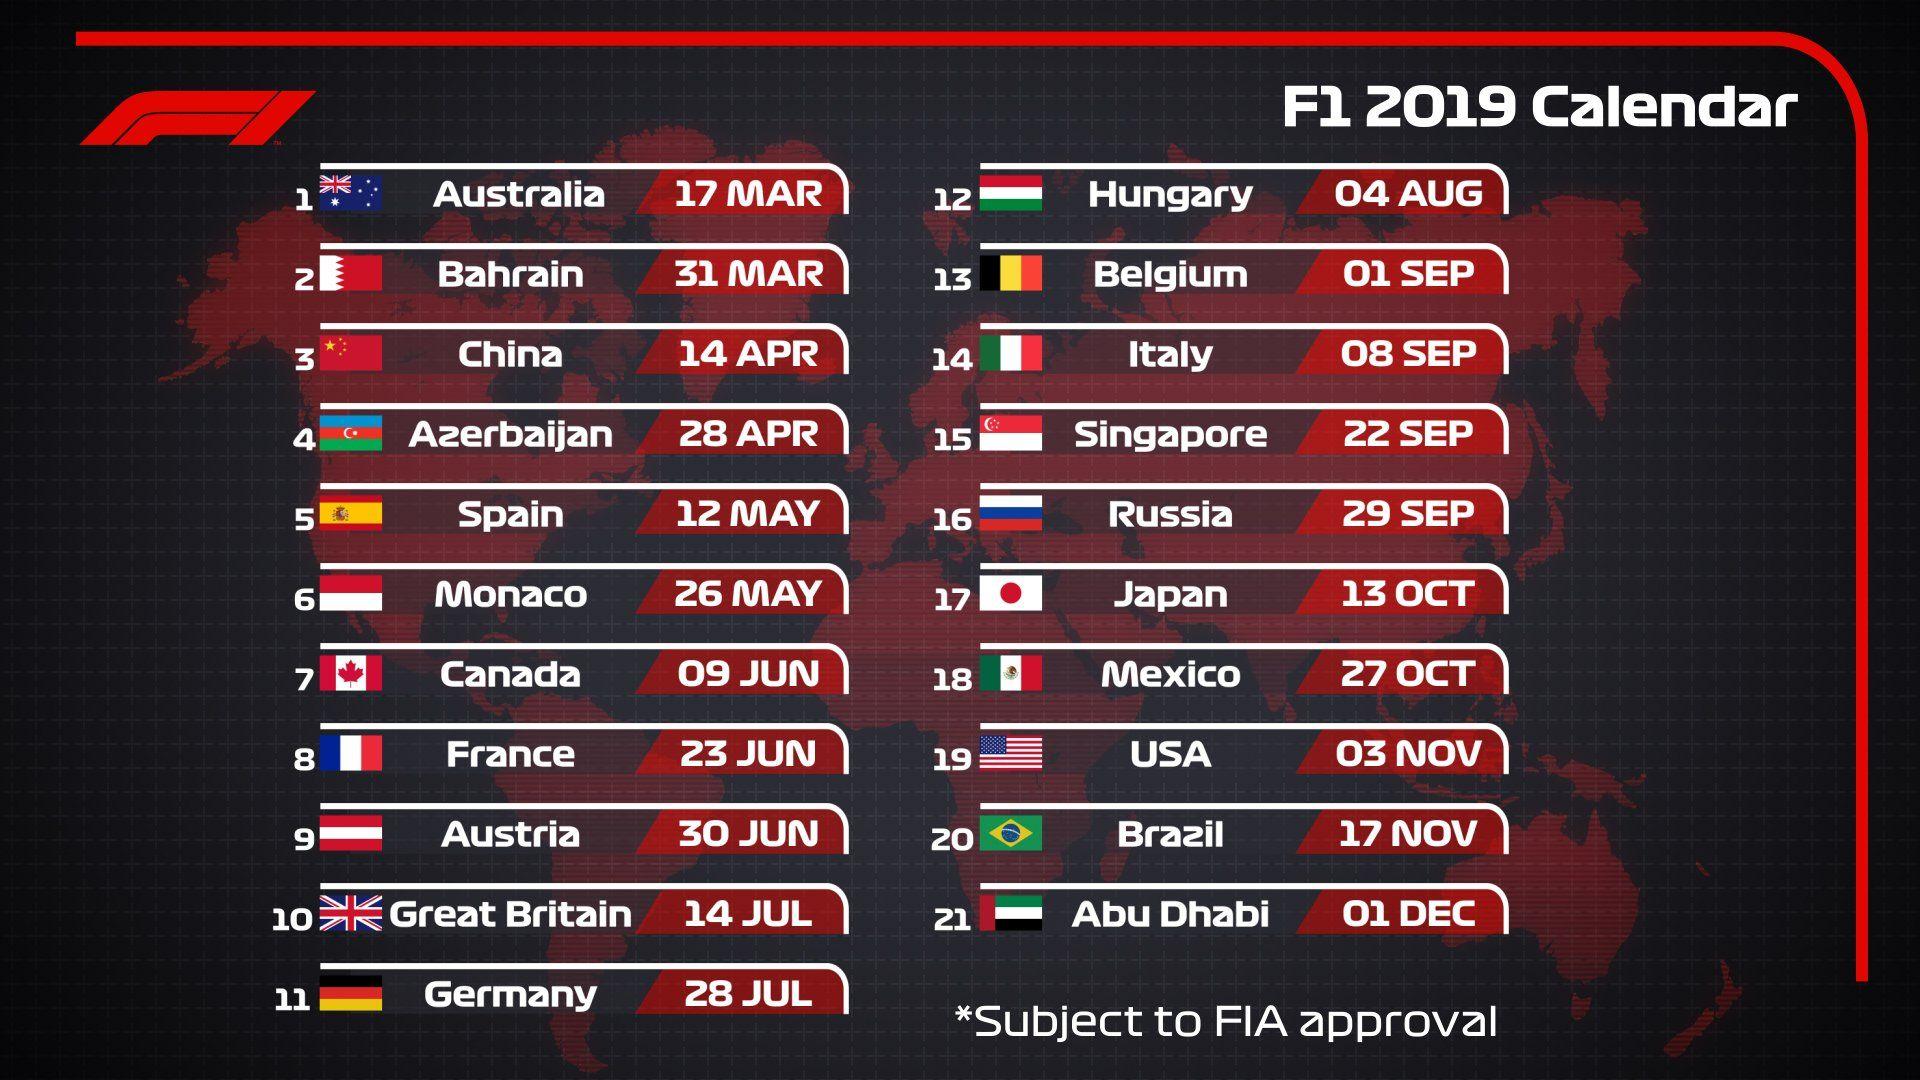 Formula One Calendar 2019 2019 F1 Calendar | F1 2018 | F1 schedule, Racing calendar, Formula 1